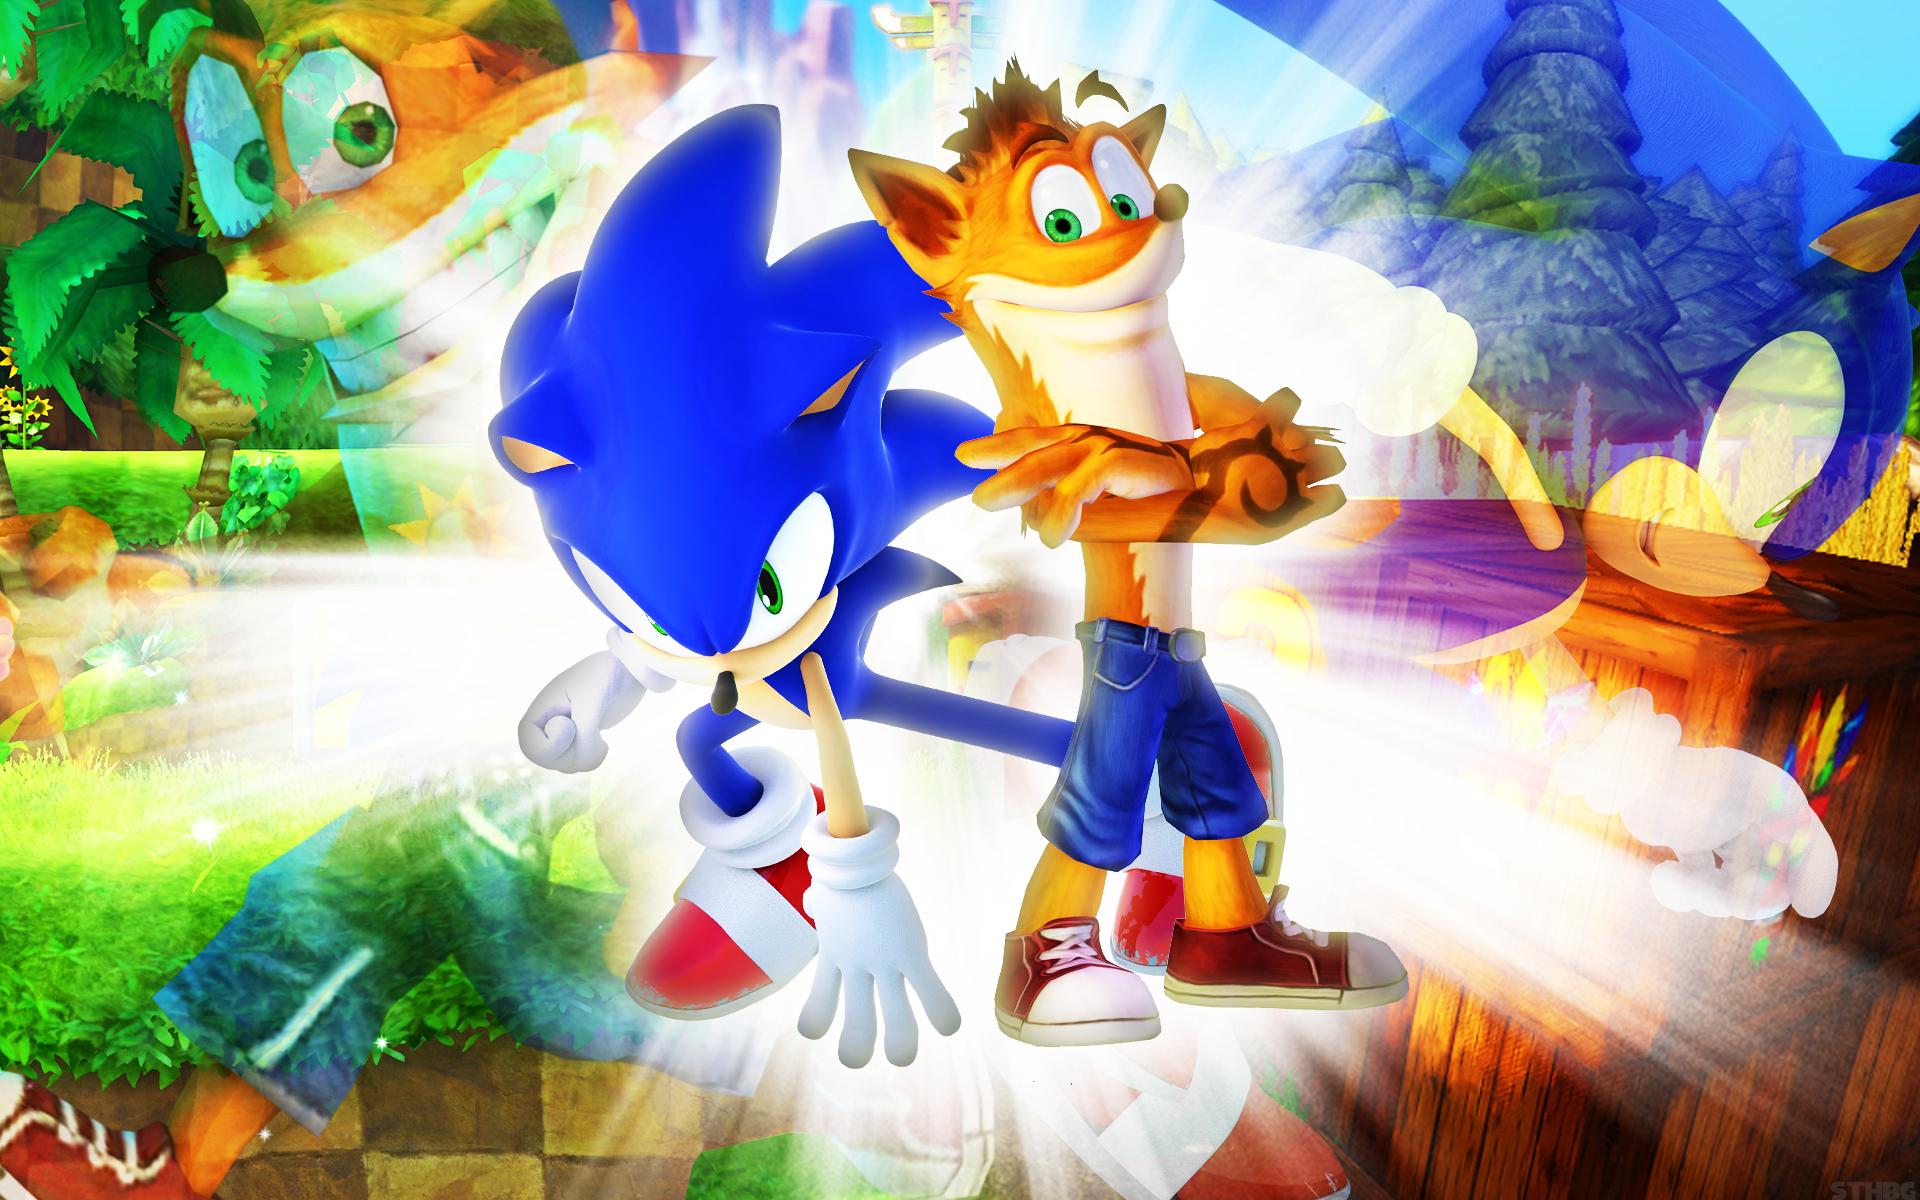 Sonic And Greninja Wallpaper Crash Bandicoot And Sonic 265935